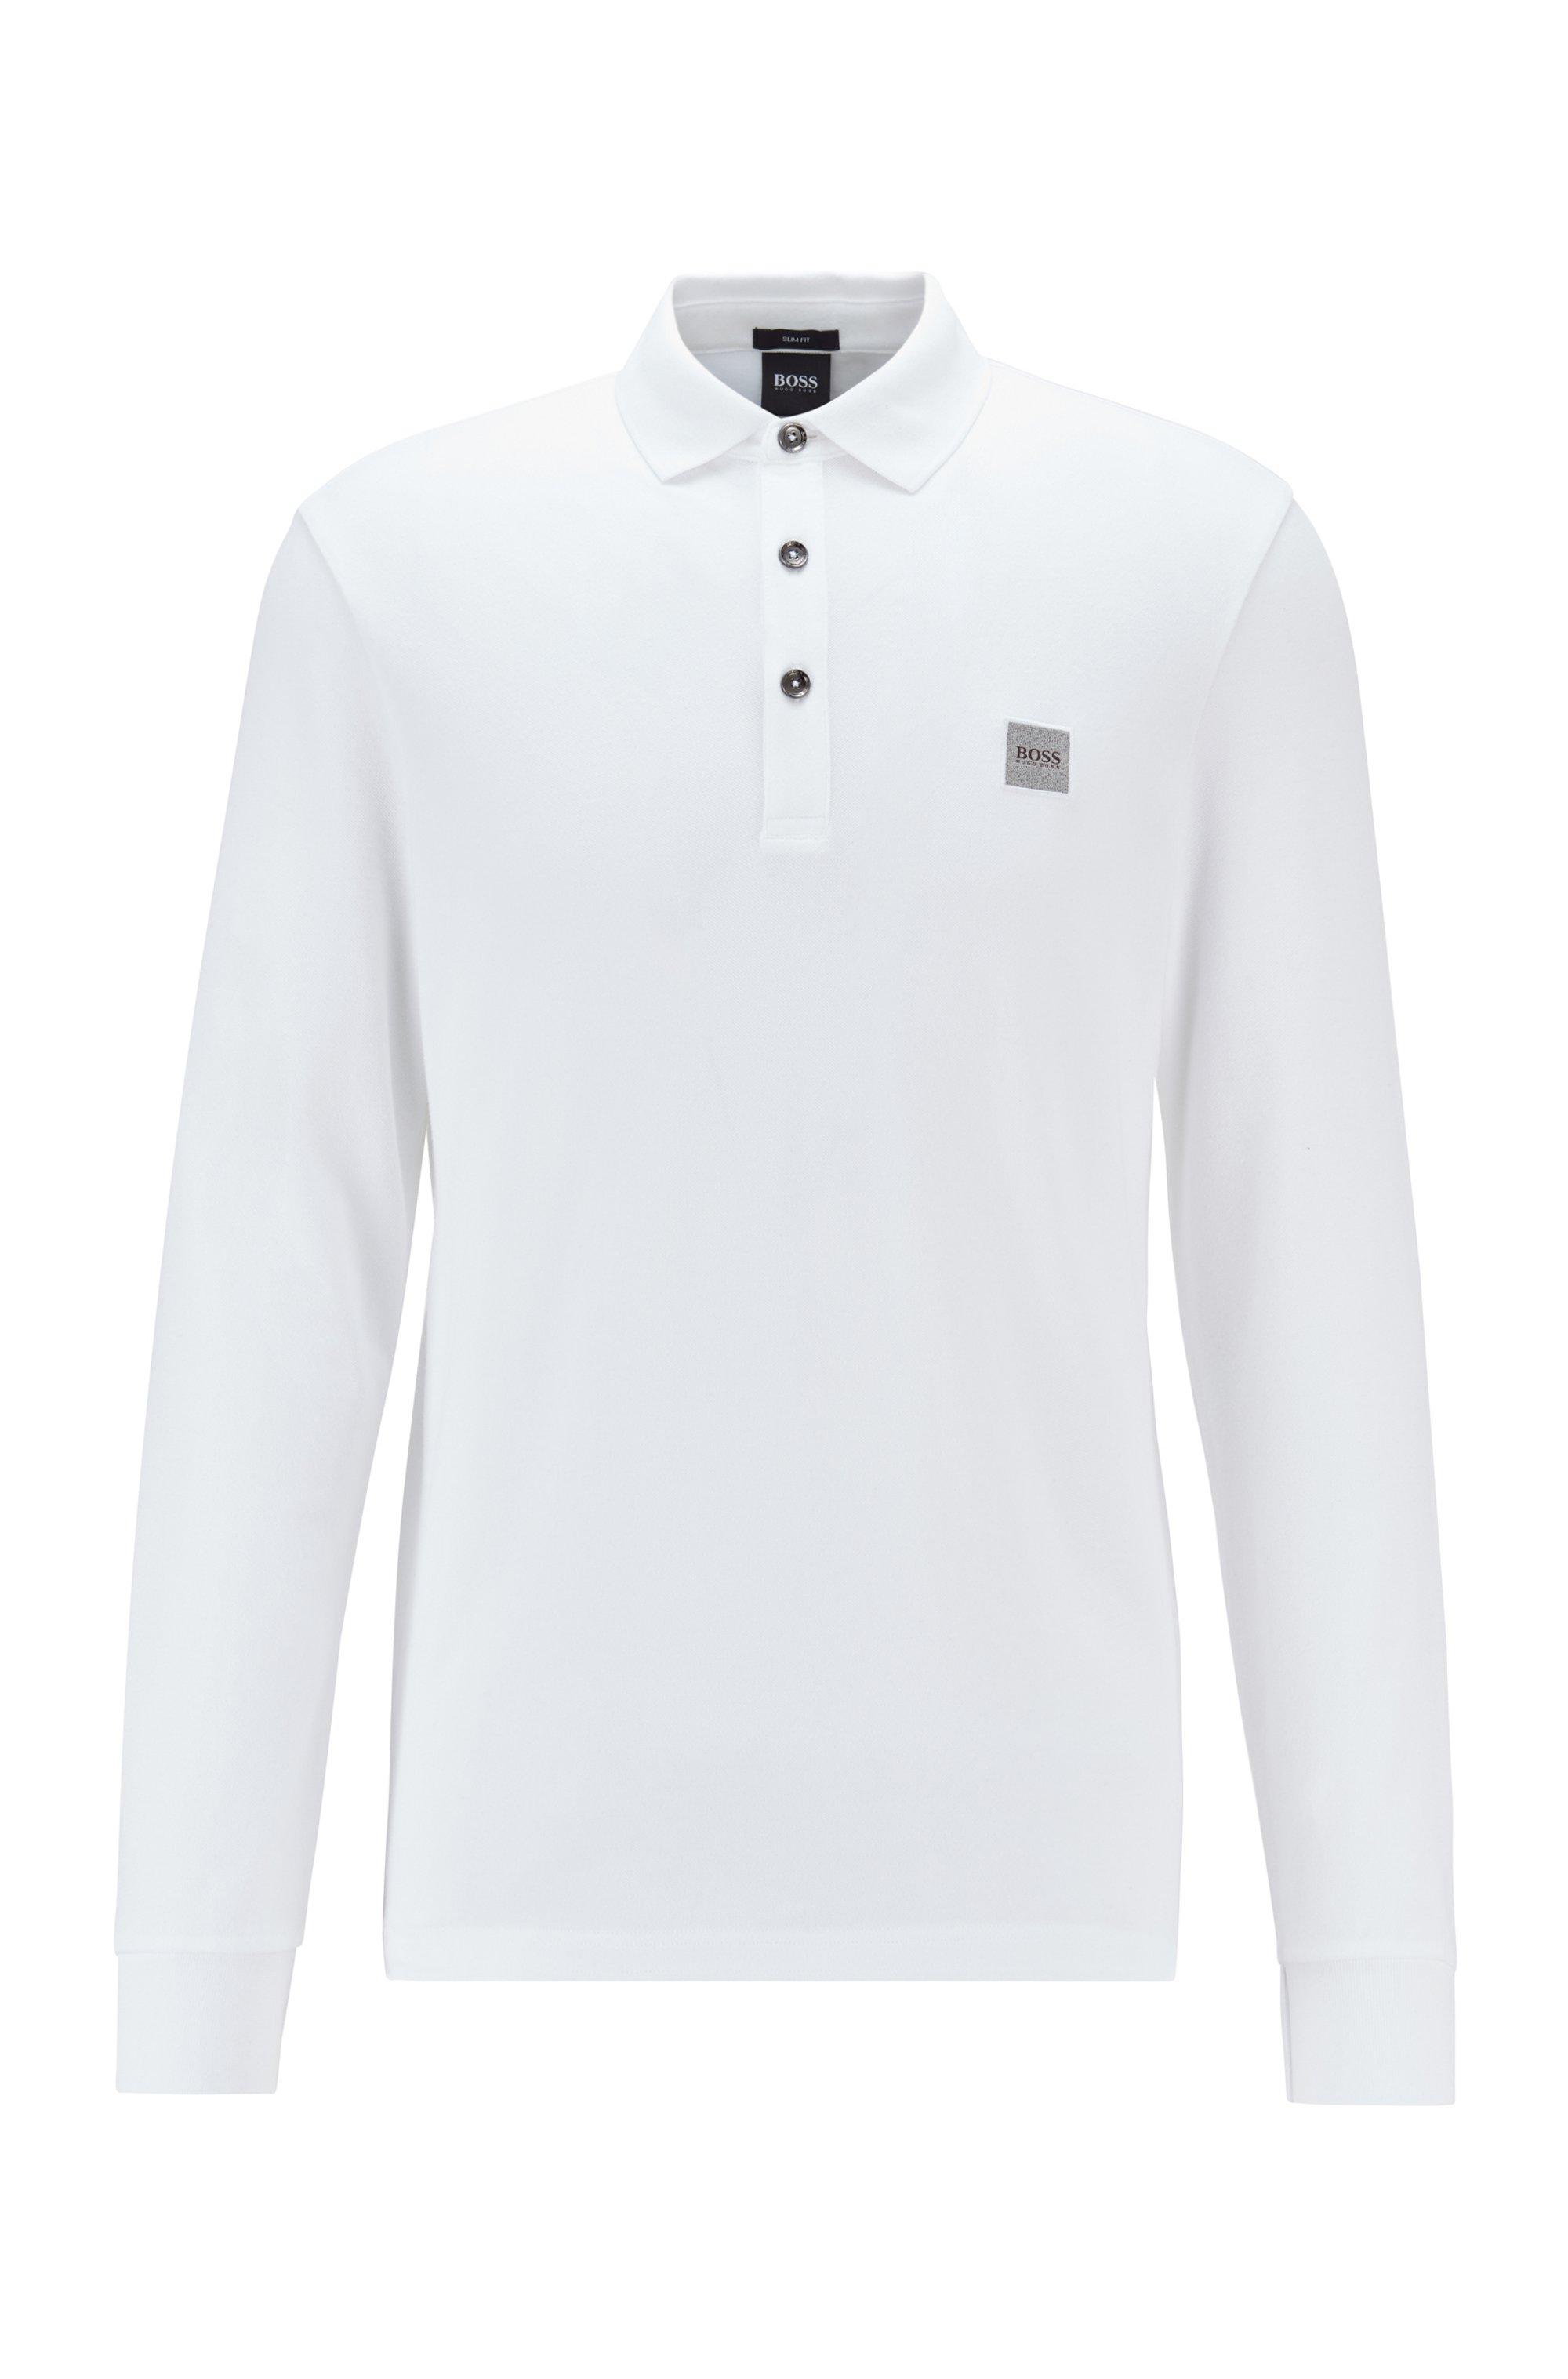 Longsleeve-Poloshirt aus elastischem Baumwoll-Piqué , Weiß